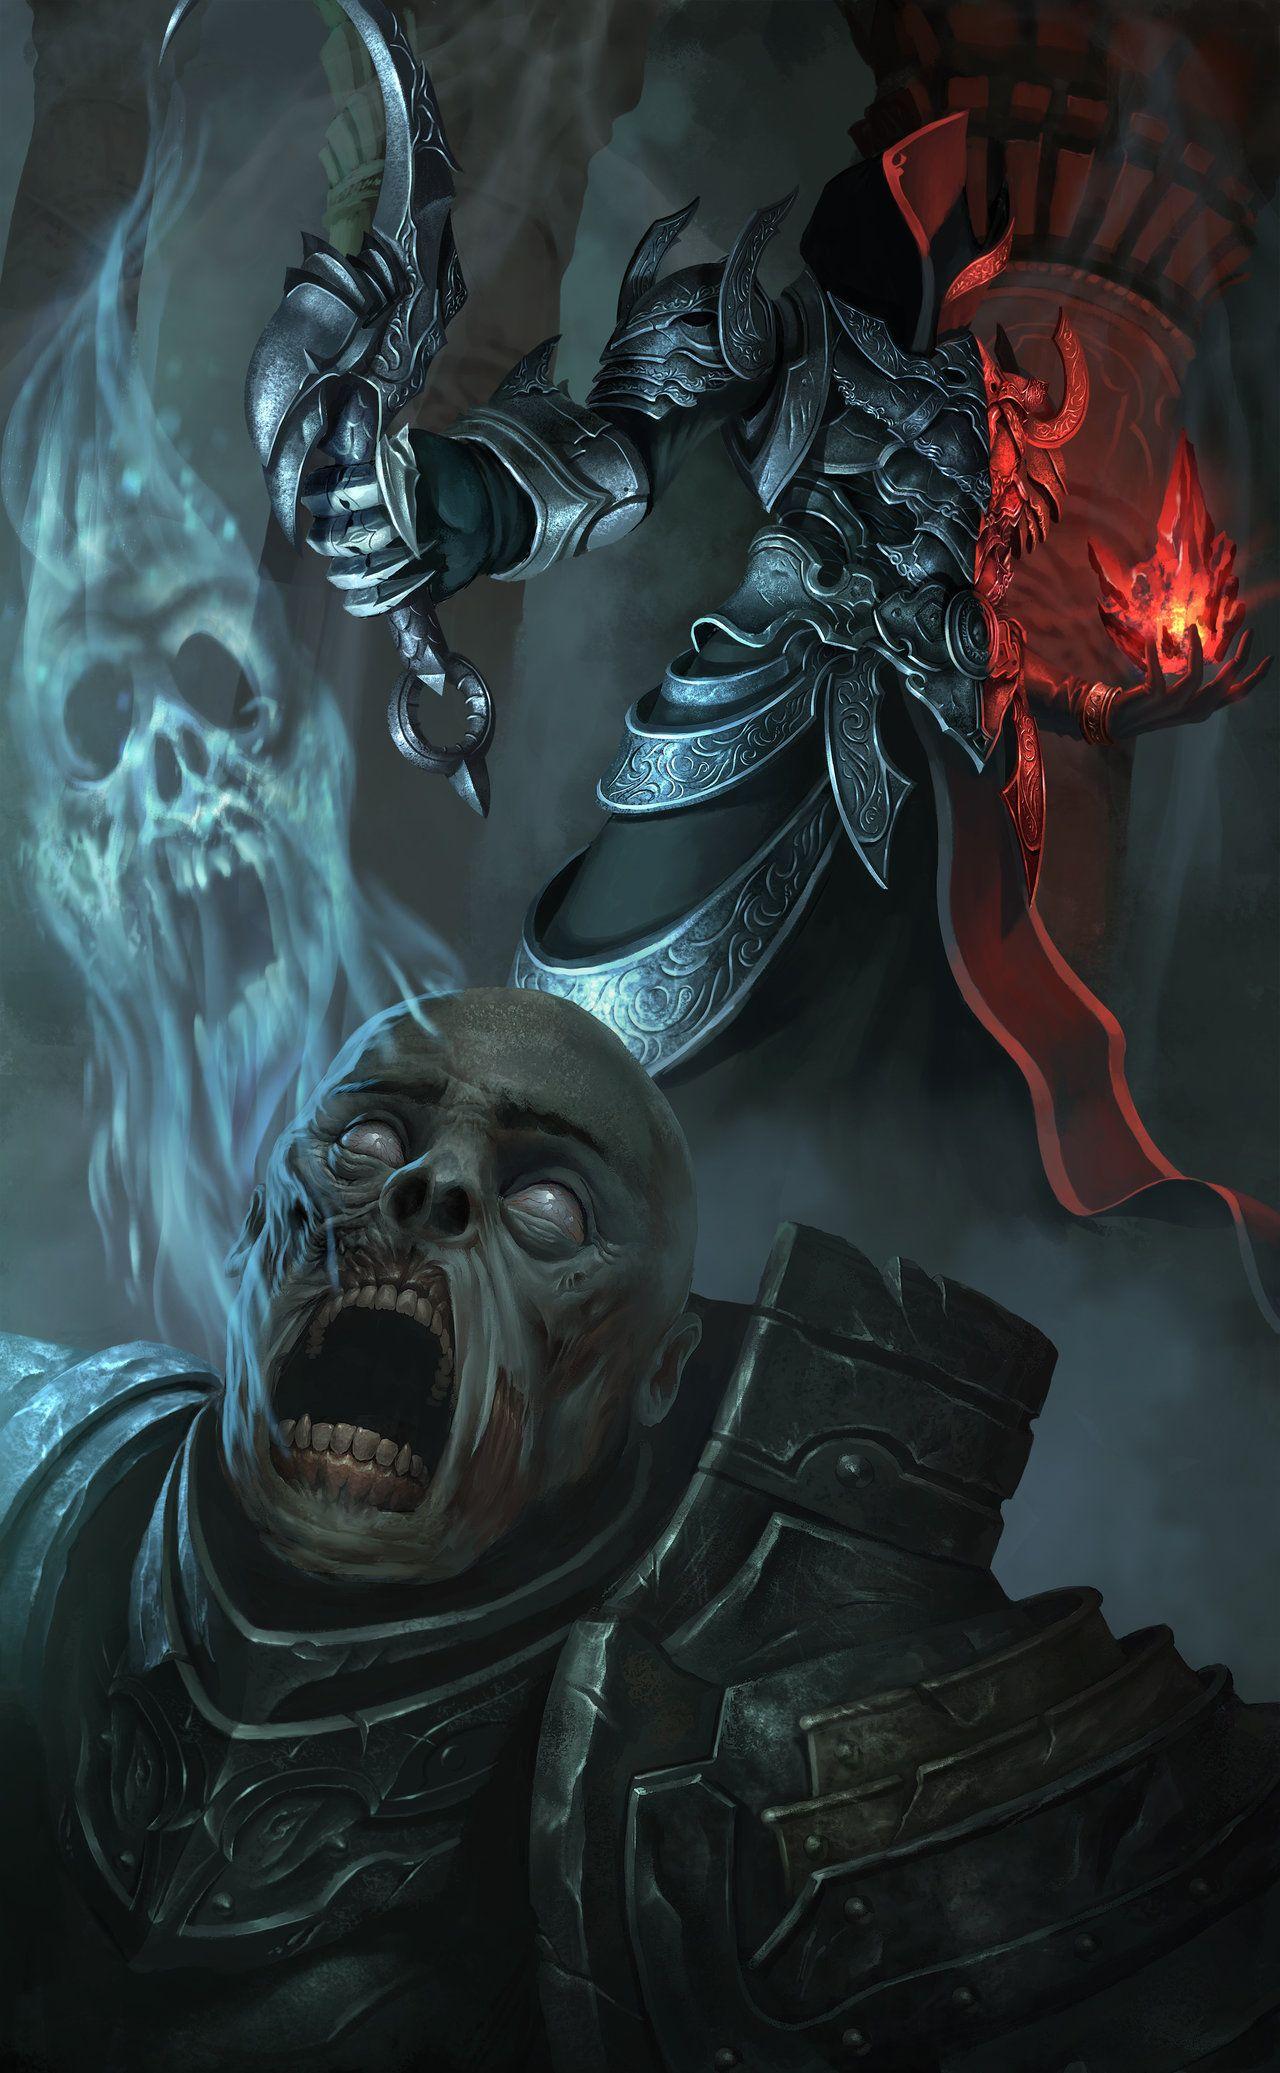 Diablo 3 Reaper Of Souls Contest By B03di On Deviantart Dark Artwork Art Fantasy Art